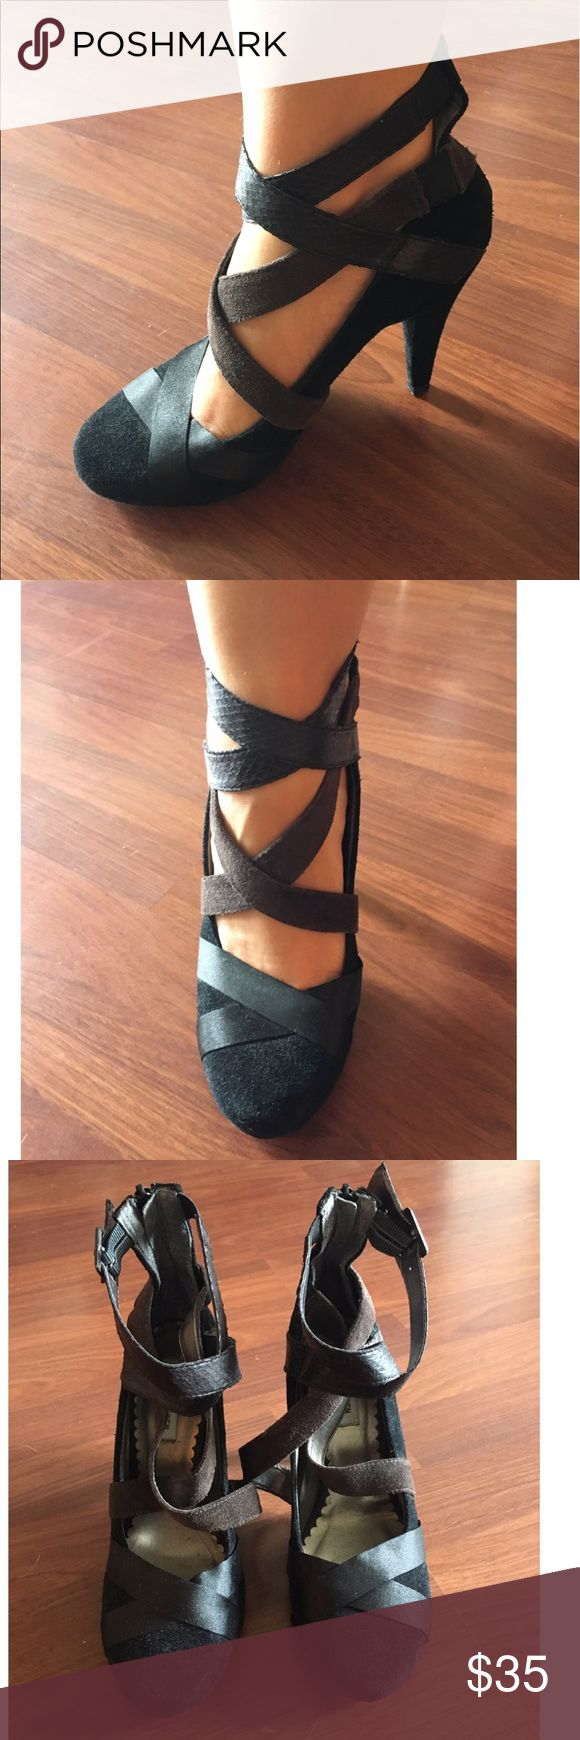 Steve Madden - Black Suede Ballet Pumps Black and brown suede ballet pumps! No scratches on heel. Barely worn. Ballet straps leather. Zipper on the back heel. Steve Madden Shoes Heels